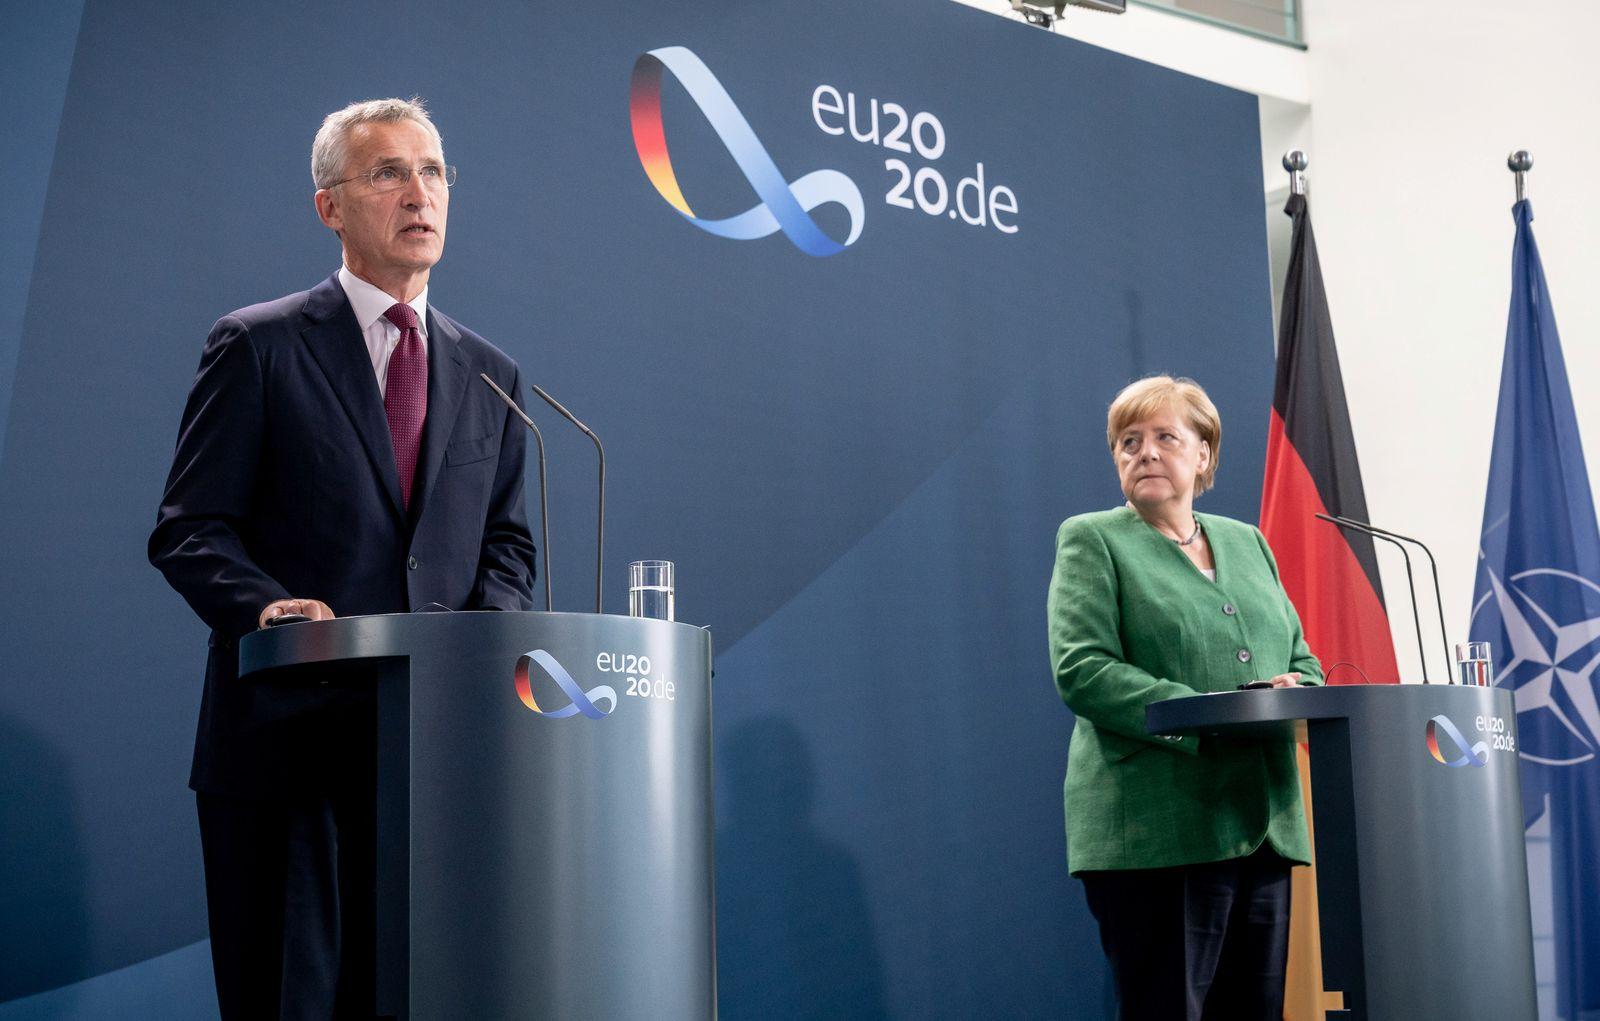 German Chancellor Angela Merkel and NATO Secretary General Jens Stoltenberg speak to reporters at chancellery in Berlin